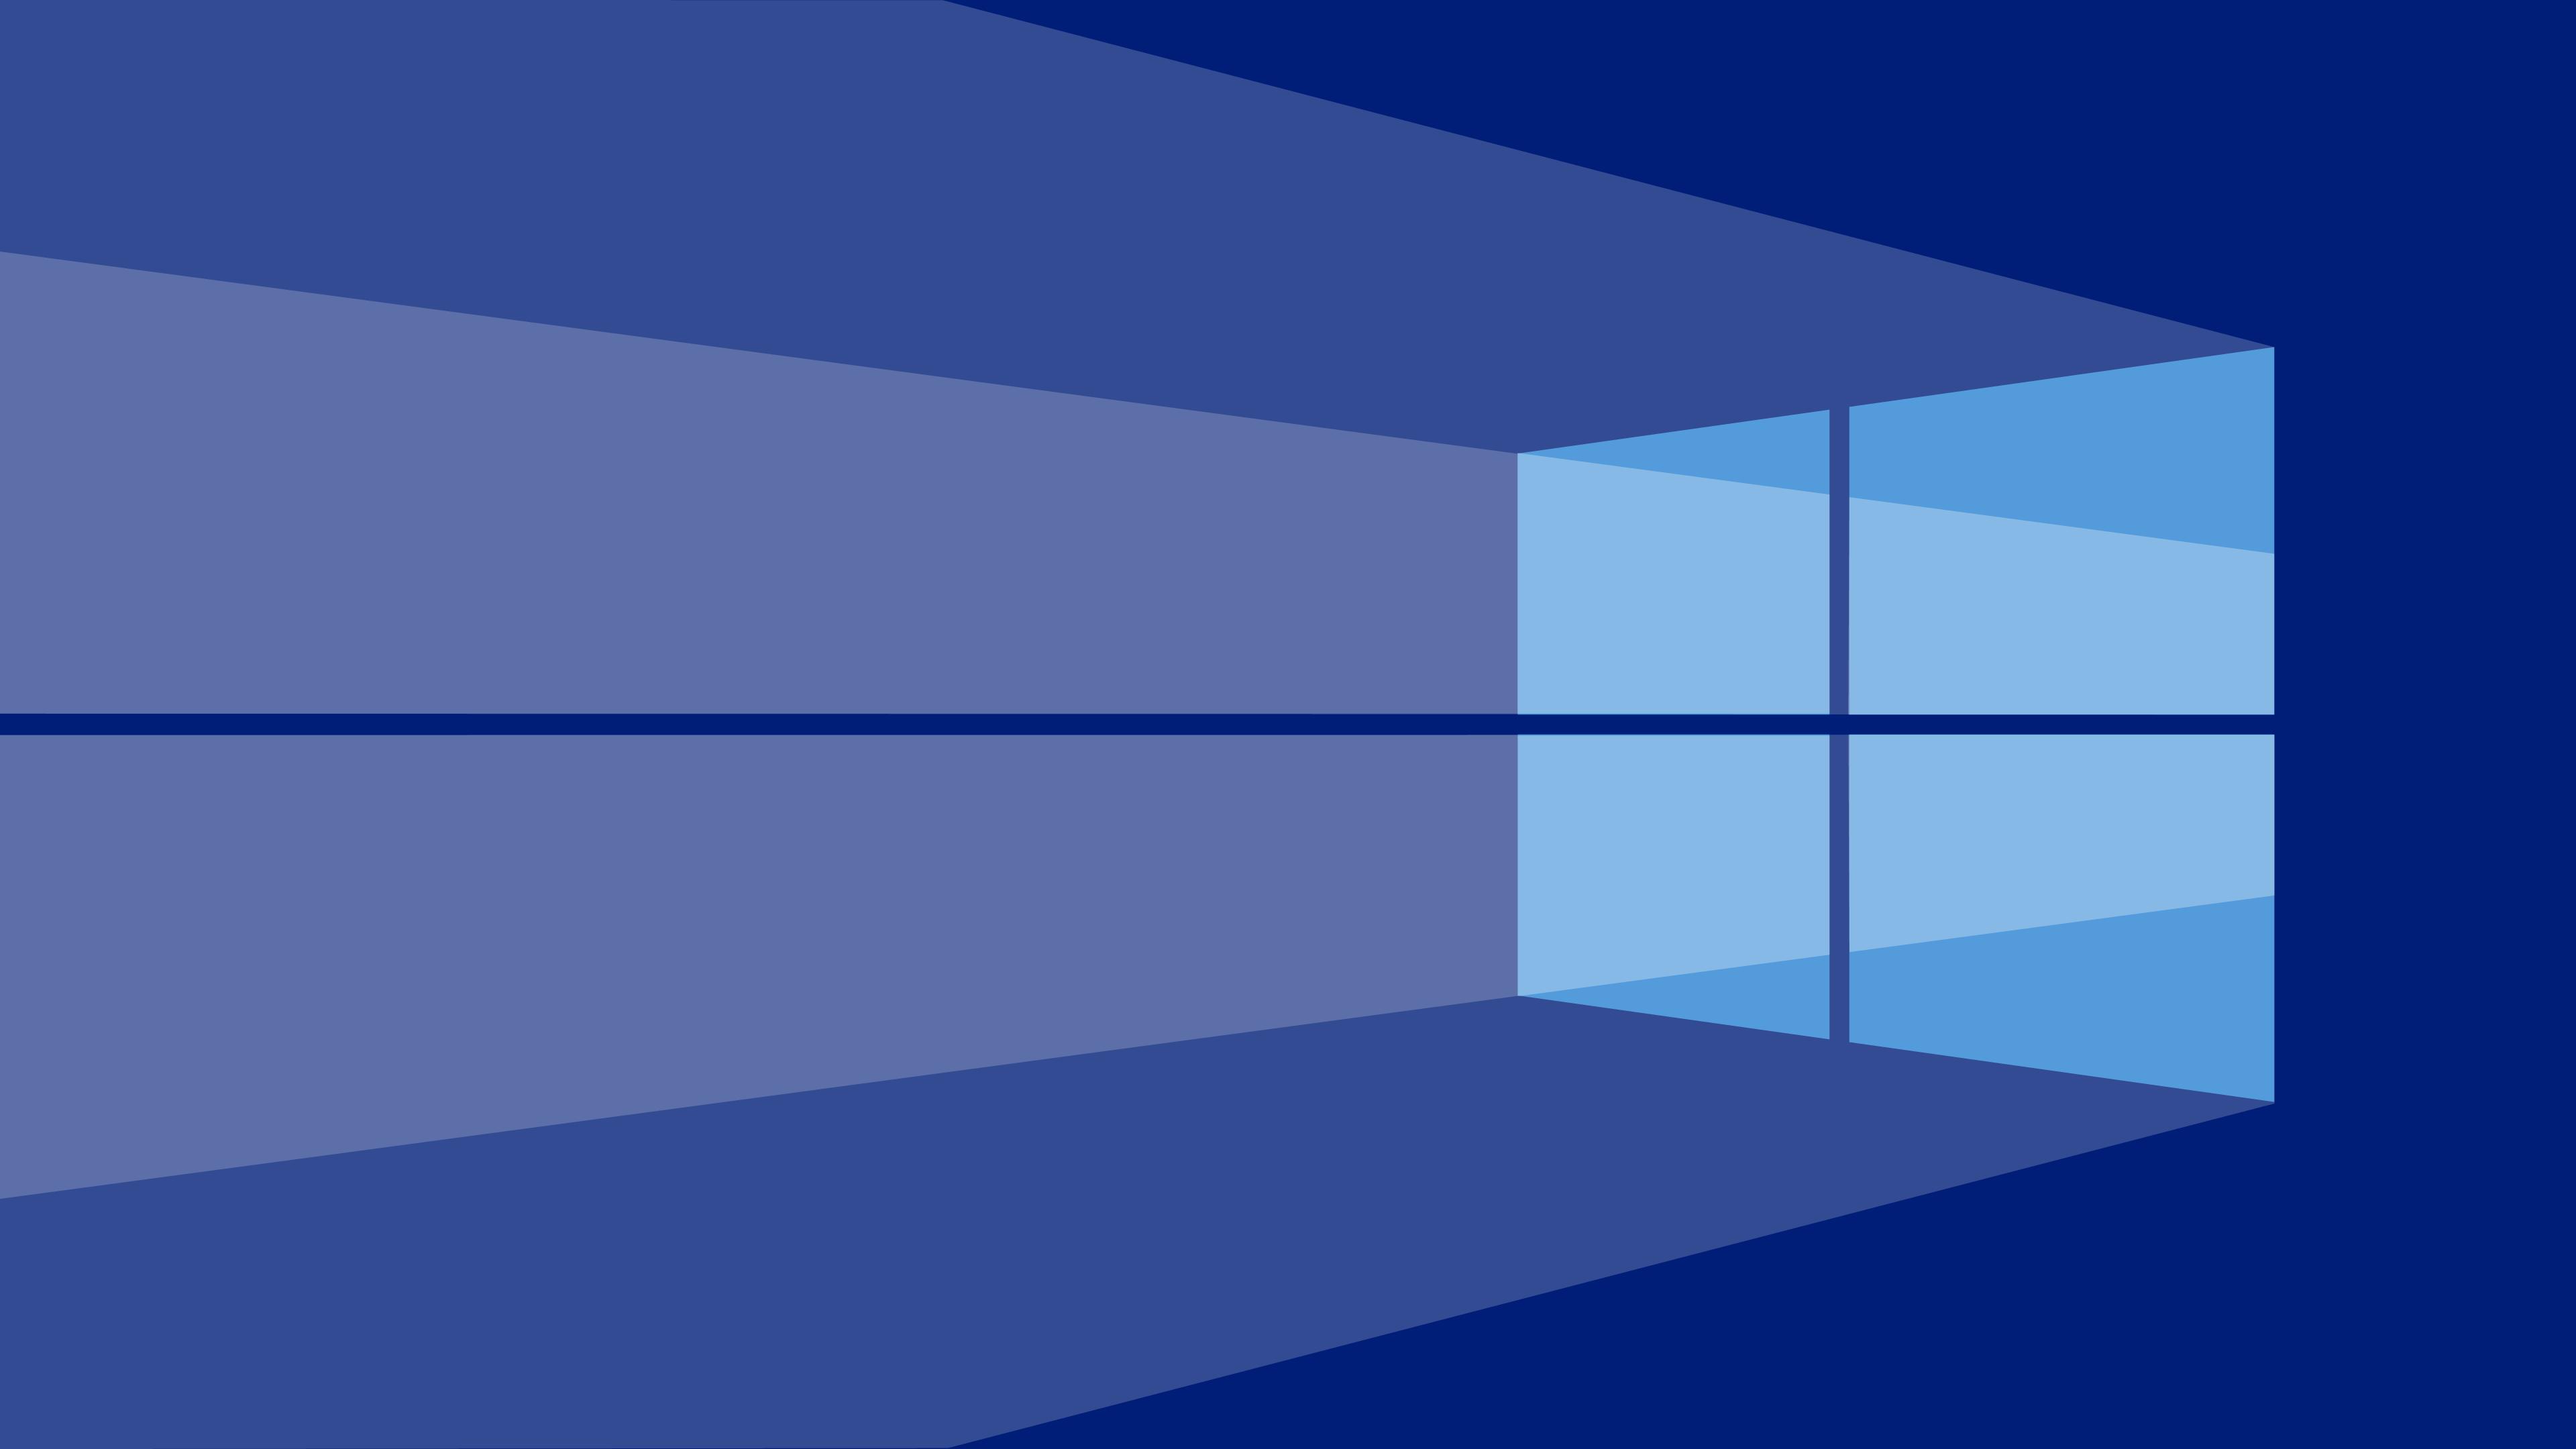 1366x768 Windows 10 Original 4k 1366x768 Resolution Hd 4k Wallpapers